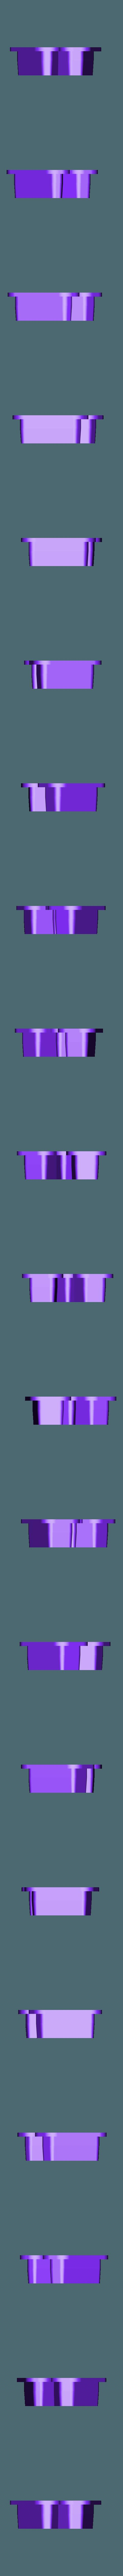 JAUNE grand W.STL Download STL file Patrol Punch (Paw Patrol) • 3D print object, Chris-tropherIlParait